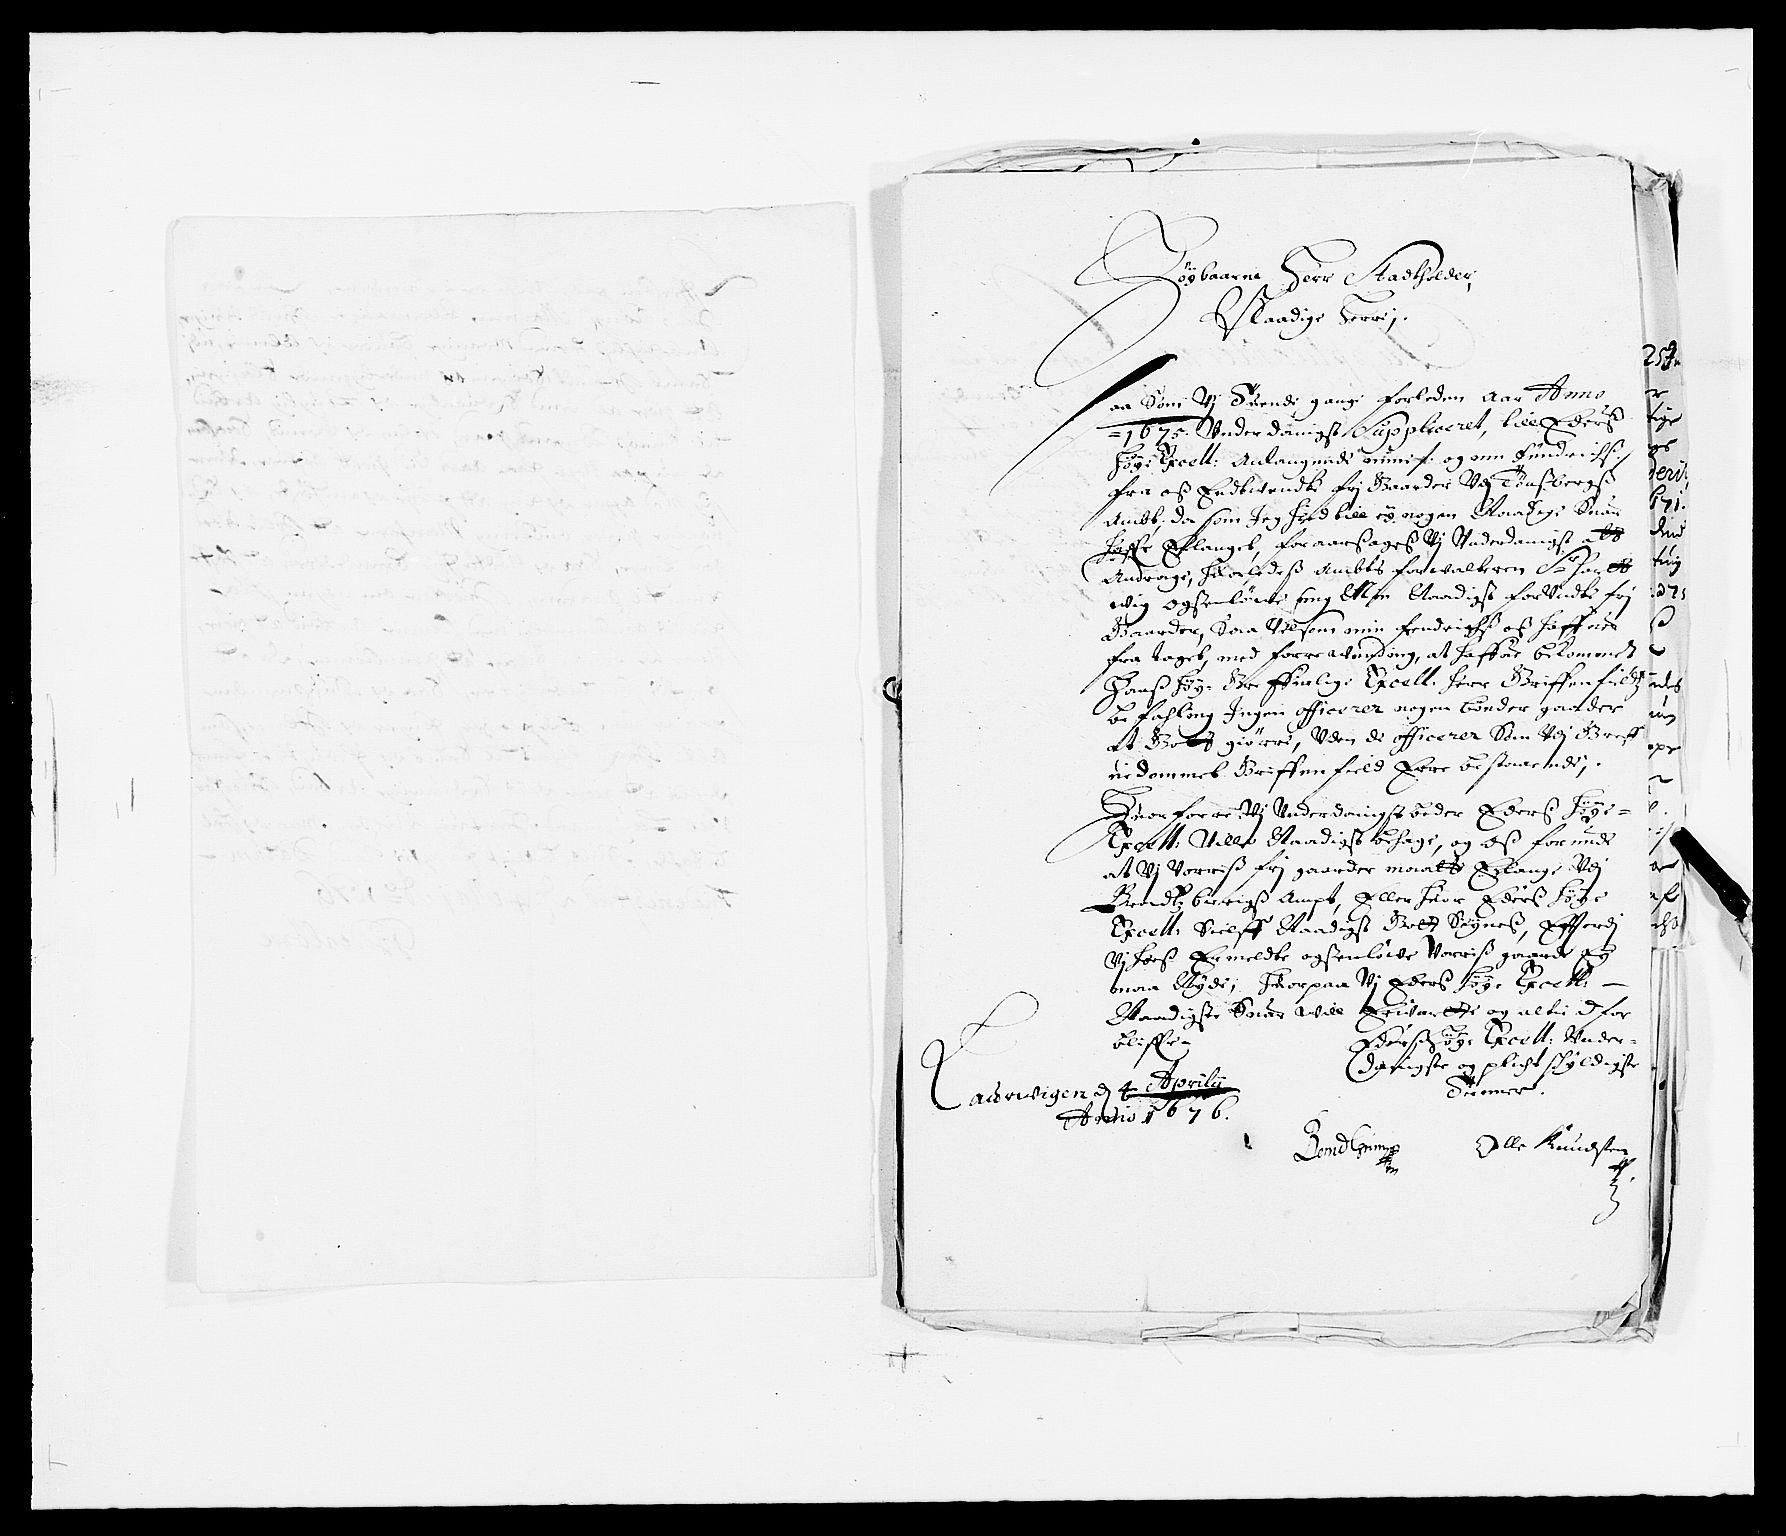 RA, Rentekammeret inntil 1814, Reviderte regnskaper, Fogderegnskap, R32/L1845: Fogderegnskap Jarlsberg grevskap, 1676-1678, s. 491